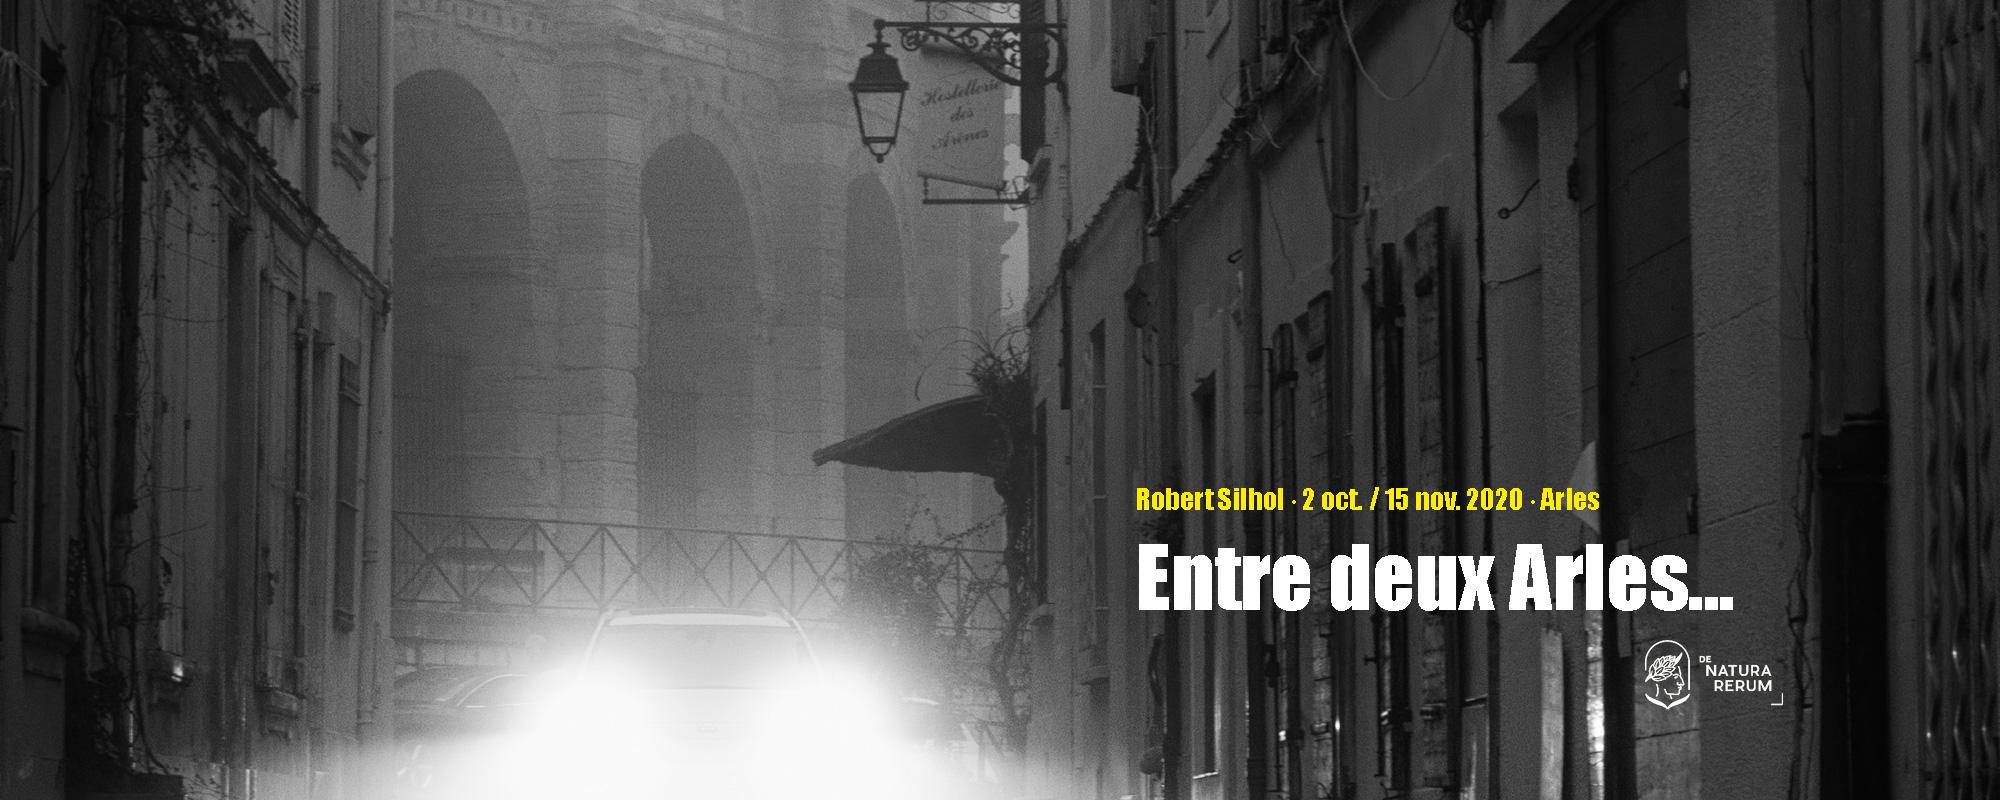 Entre deux Arles Robert Silhol De natura rerum Arles 2020